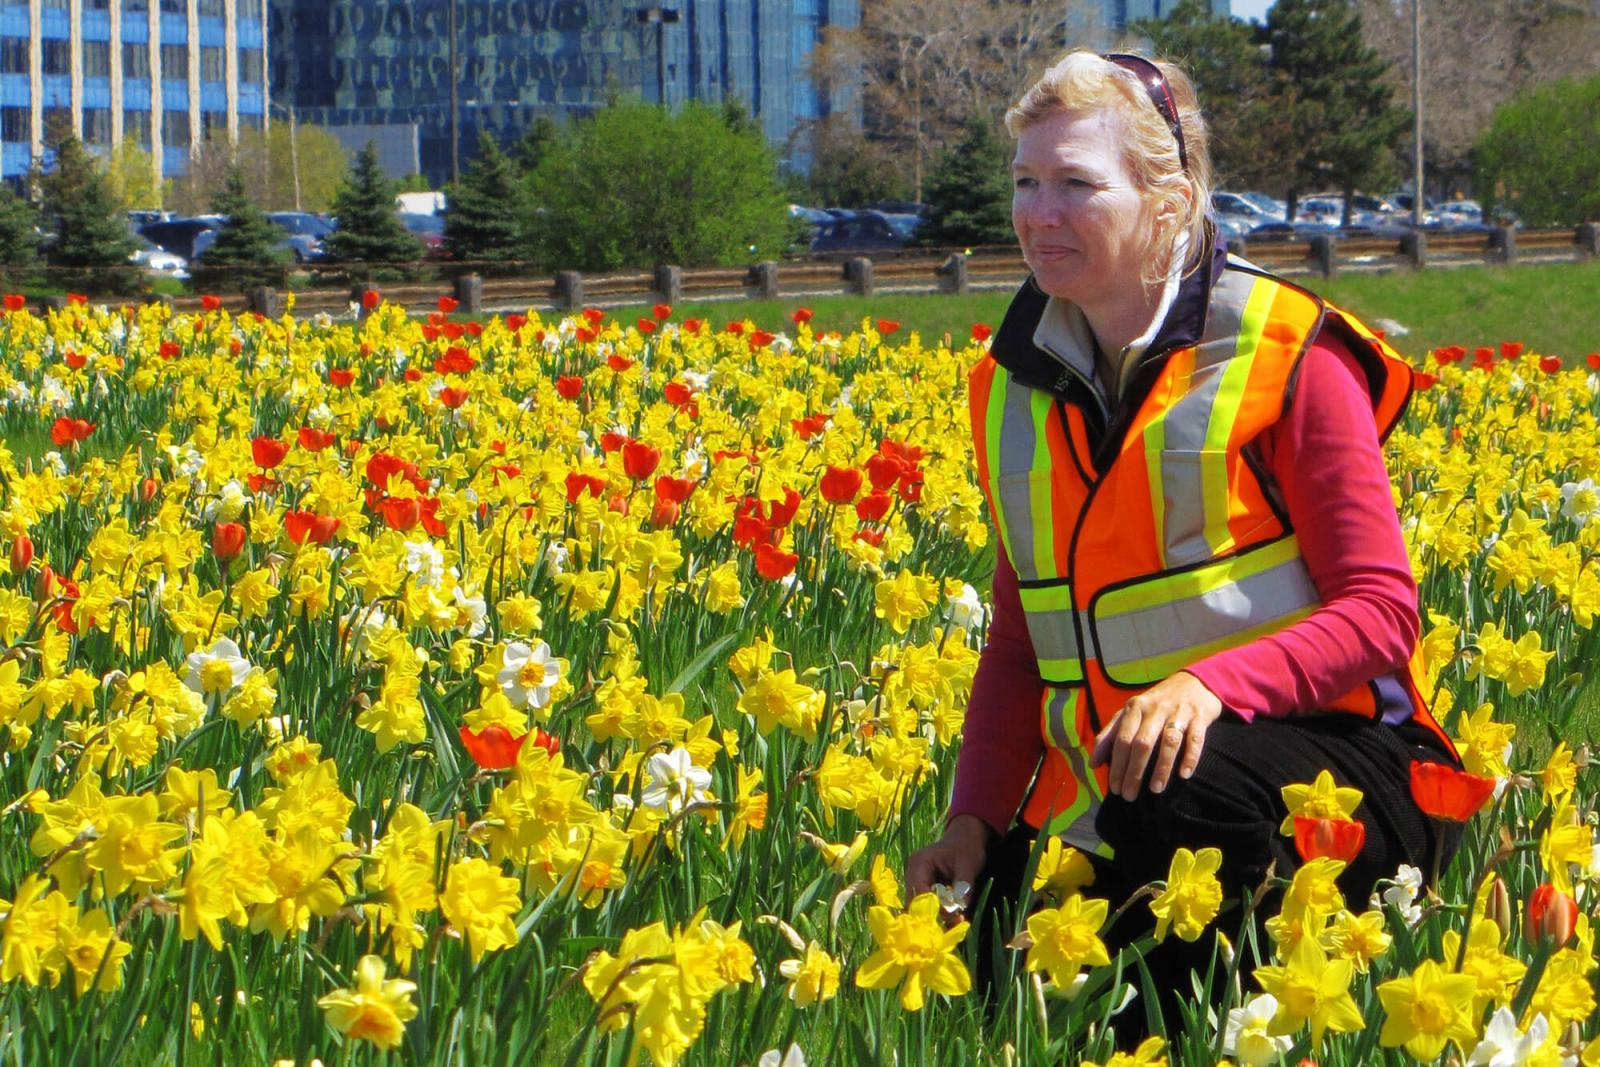 Caroline de Vries takes on the task of planting spring flowers beside busy highways.